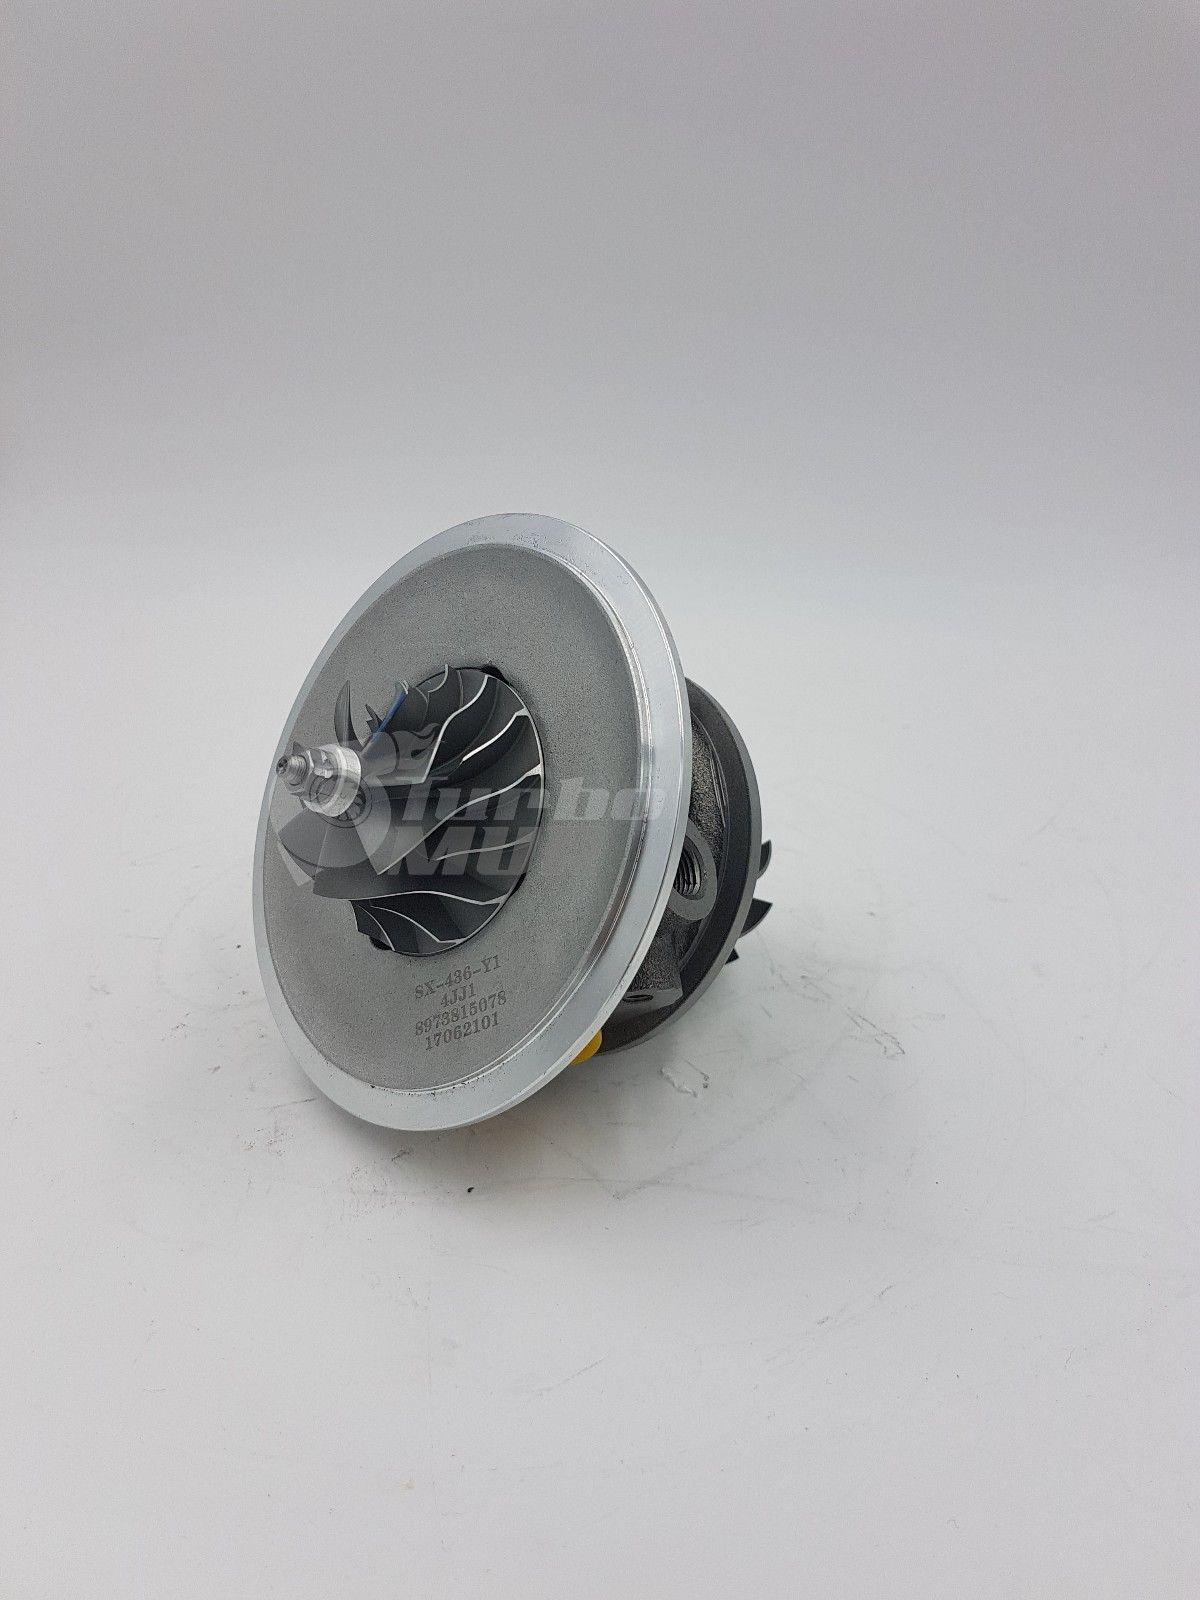 Turbomur - Cartucho Isuzu IHI 3.0L 96KW / 131CV